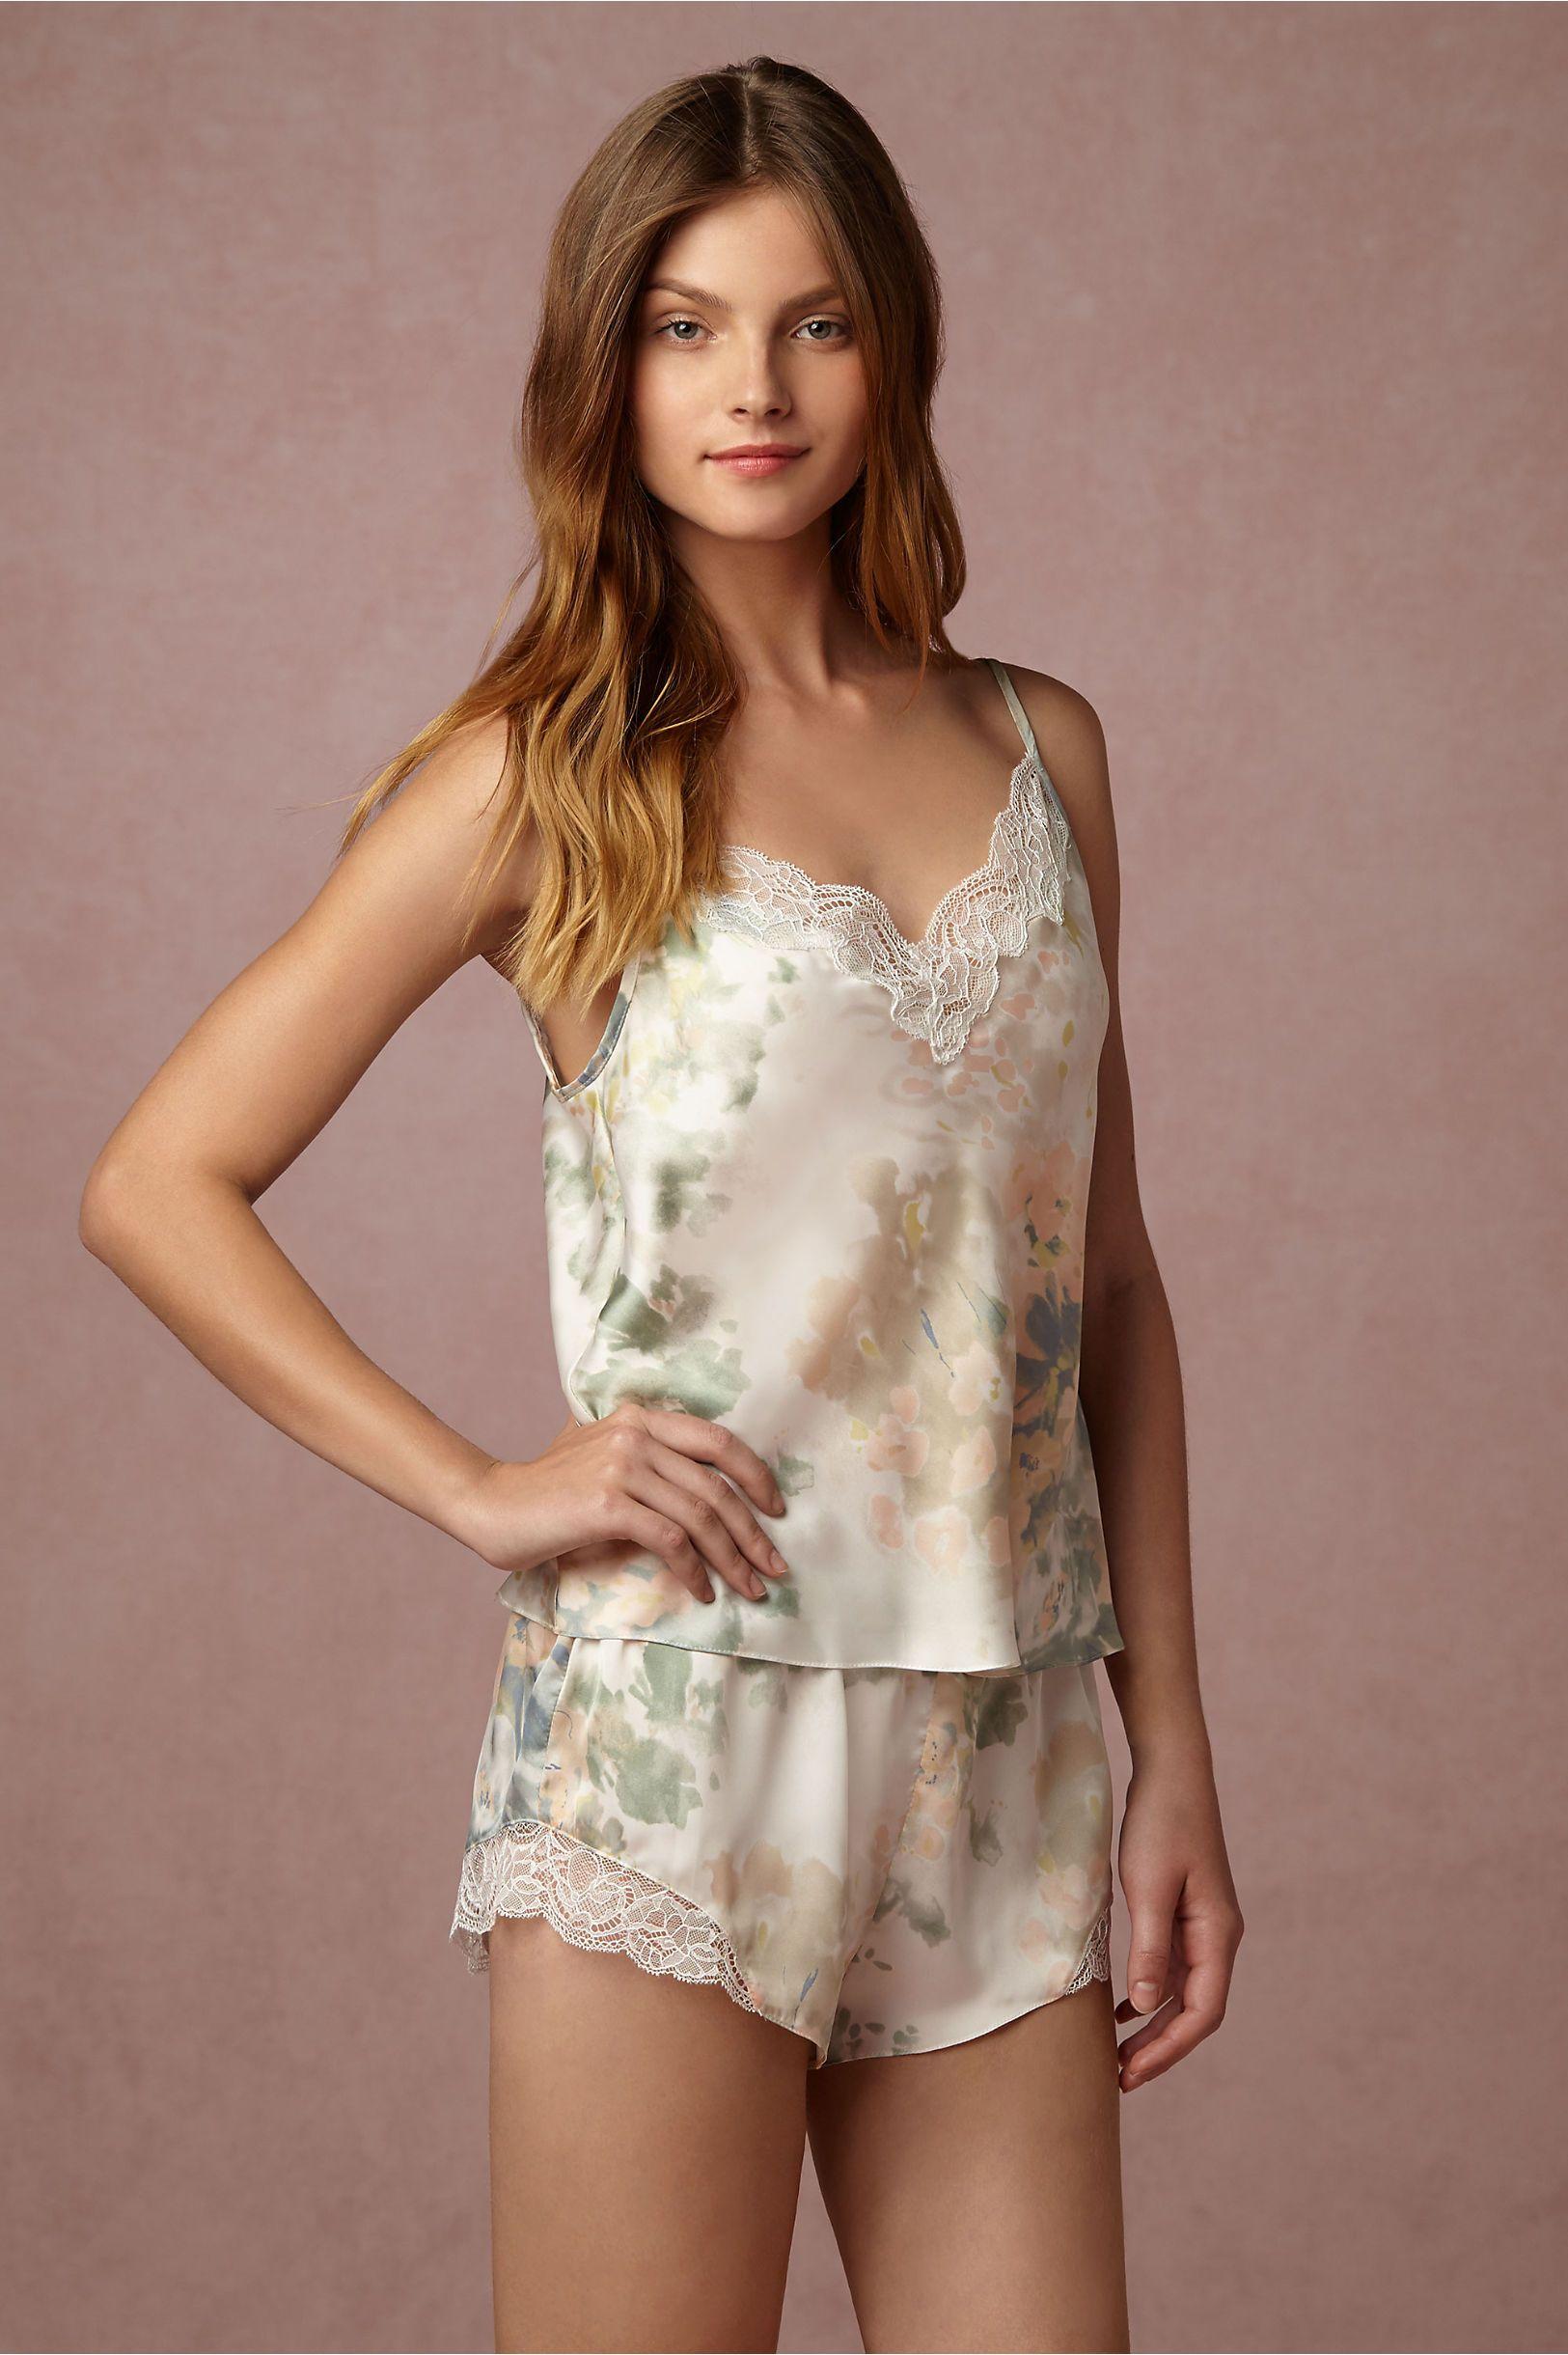 48547c1894f BHLDN Whispering Blooms Cami   Shorts Set in Bridesmaids Bridesmaid  Accessories at BHLDN